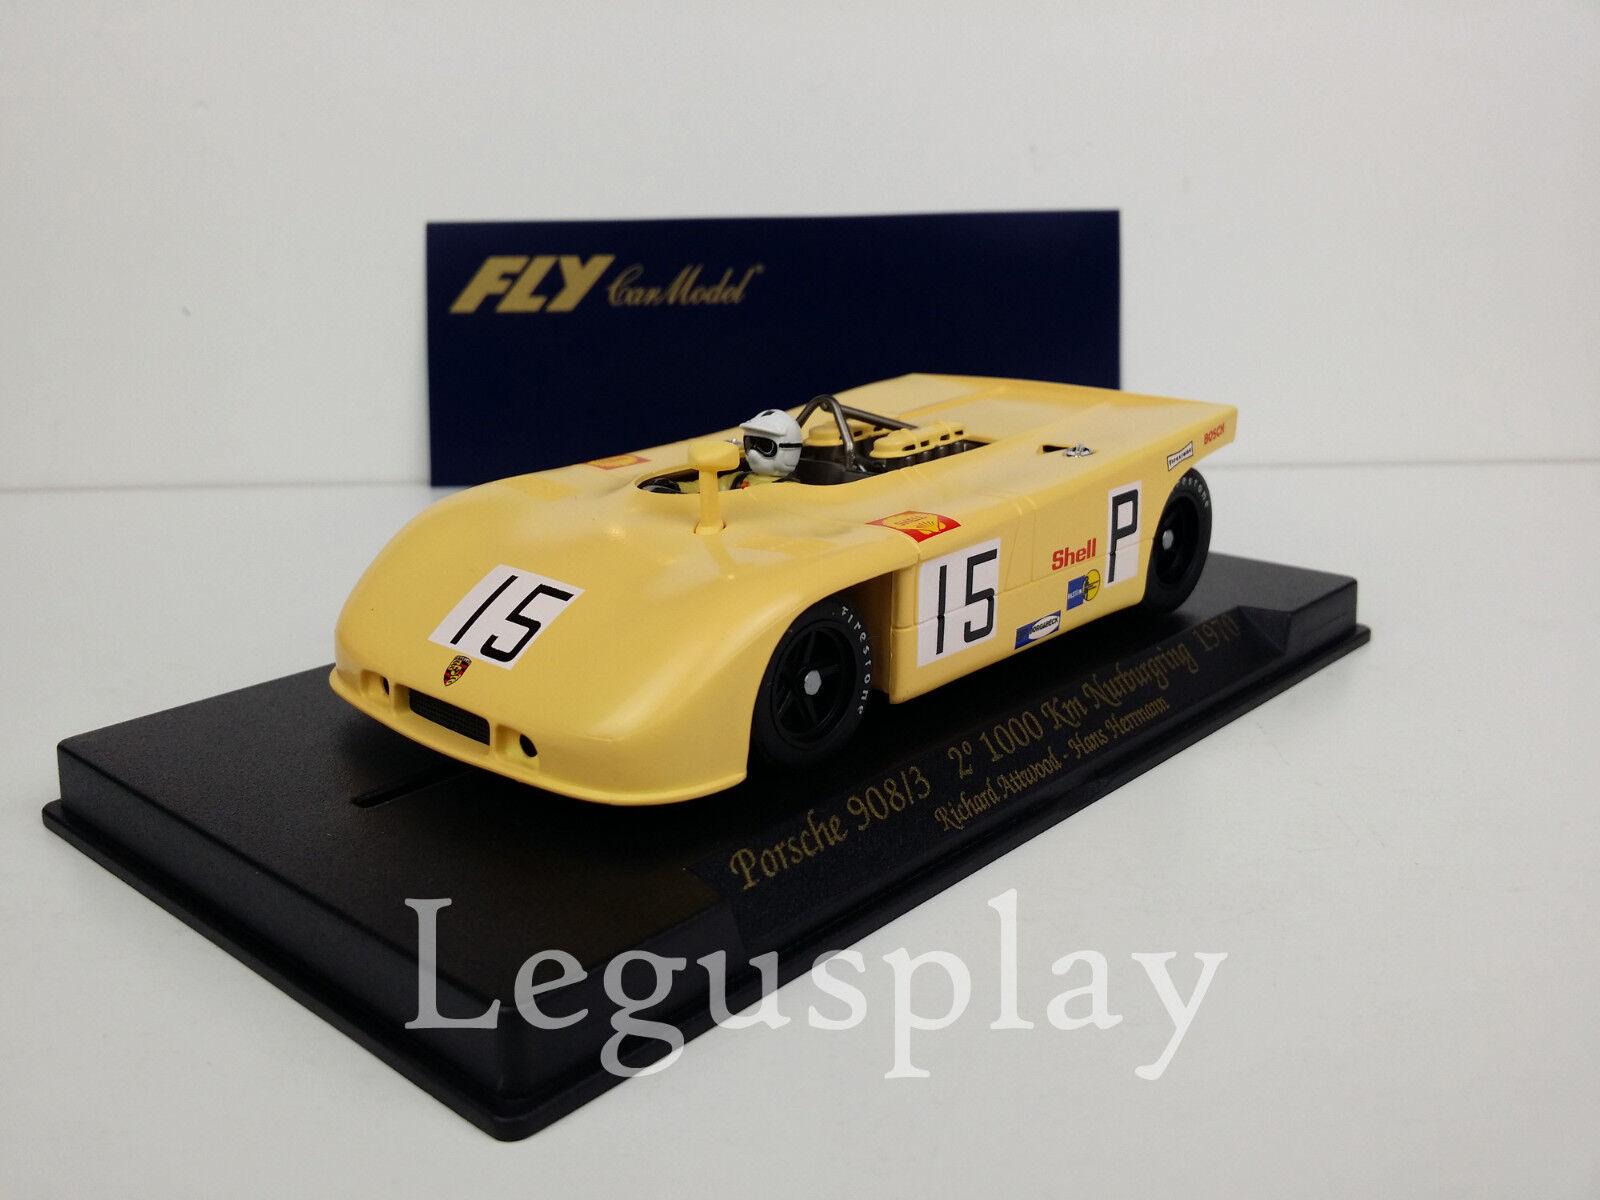 Slot car SCX Scalextric Fly 88023 C69 Porsche 908 3 2º 1000Km Nurburgring 1970